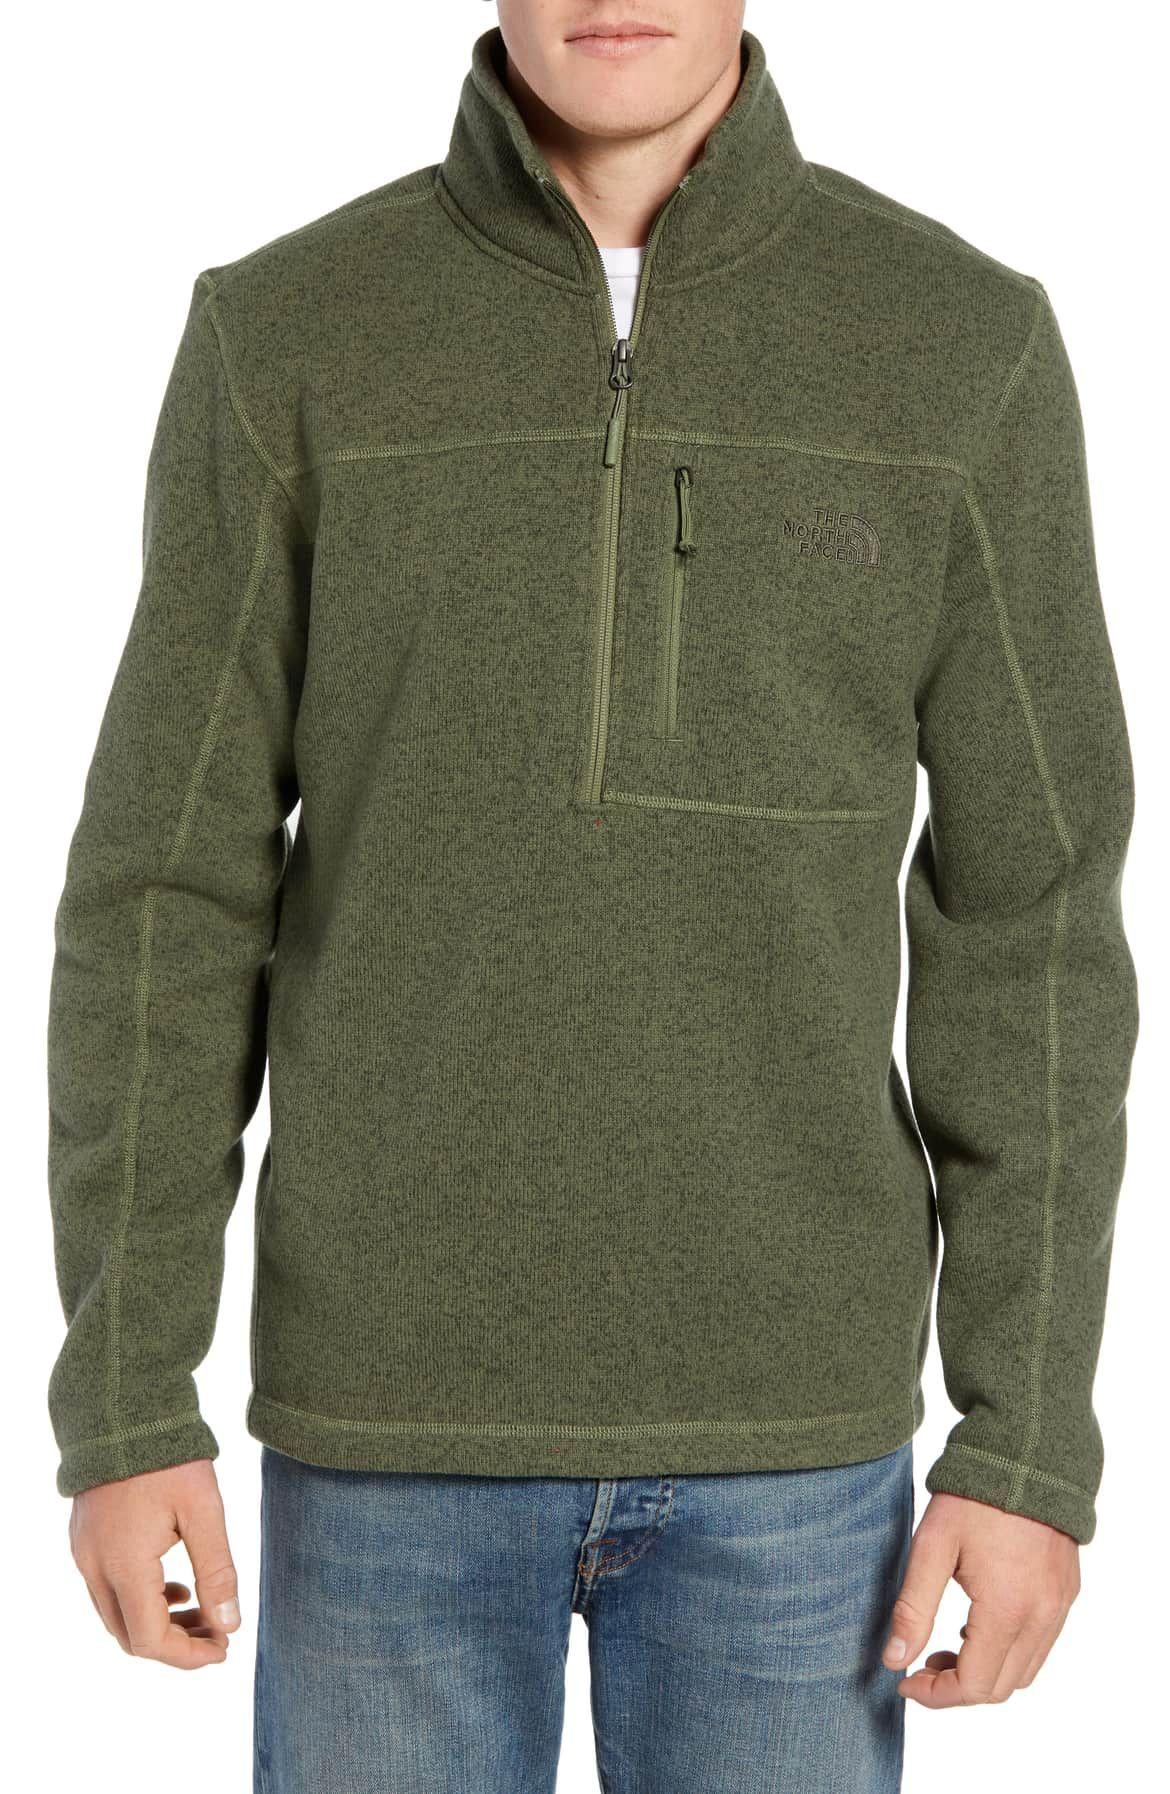 e0fd85bd4 Gordon Lyons Quarter-Zip Fleece Jacket, Main, color, FOUR LEAF ...